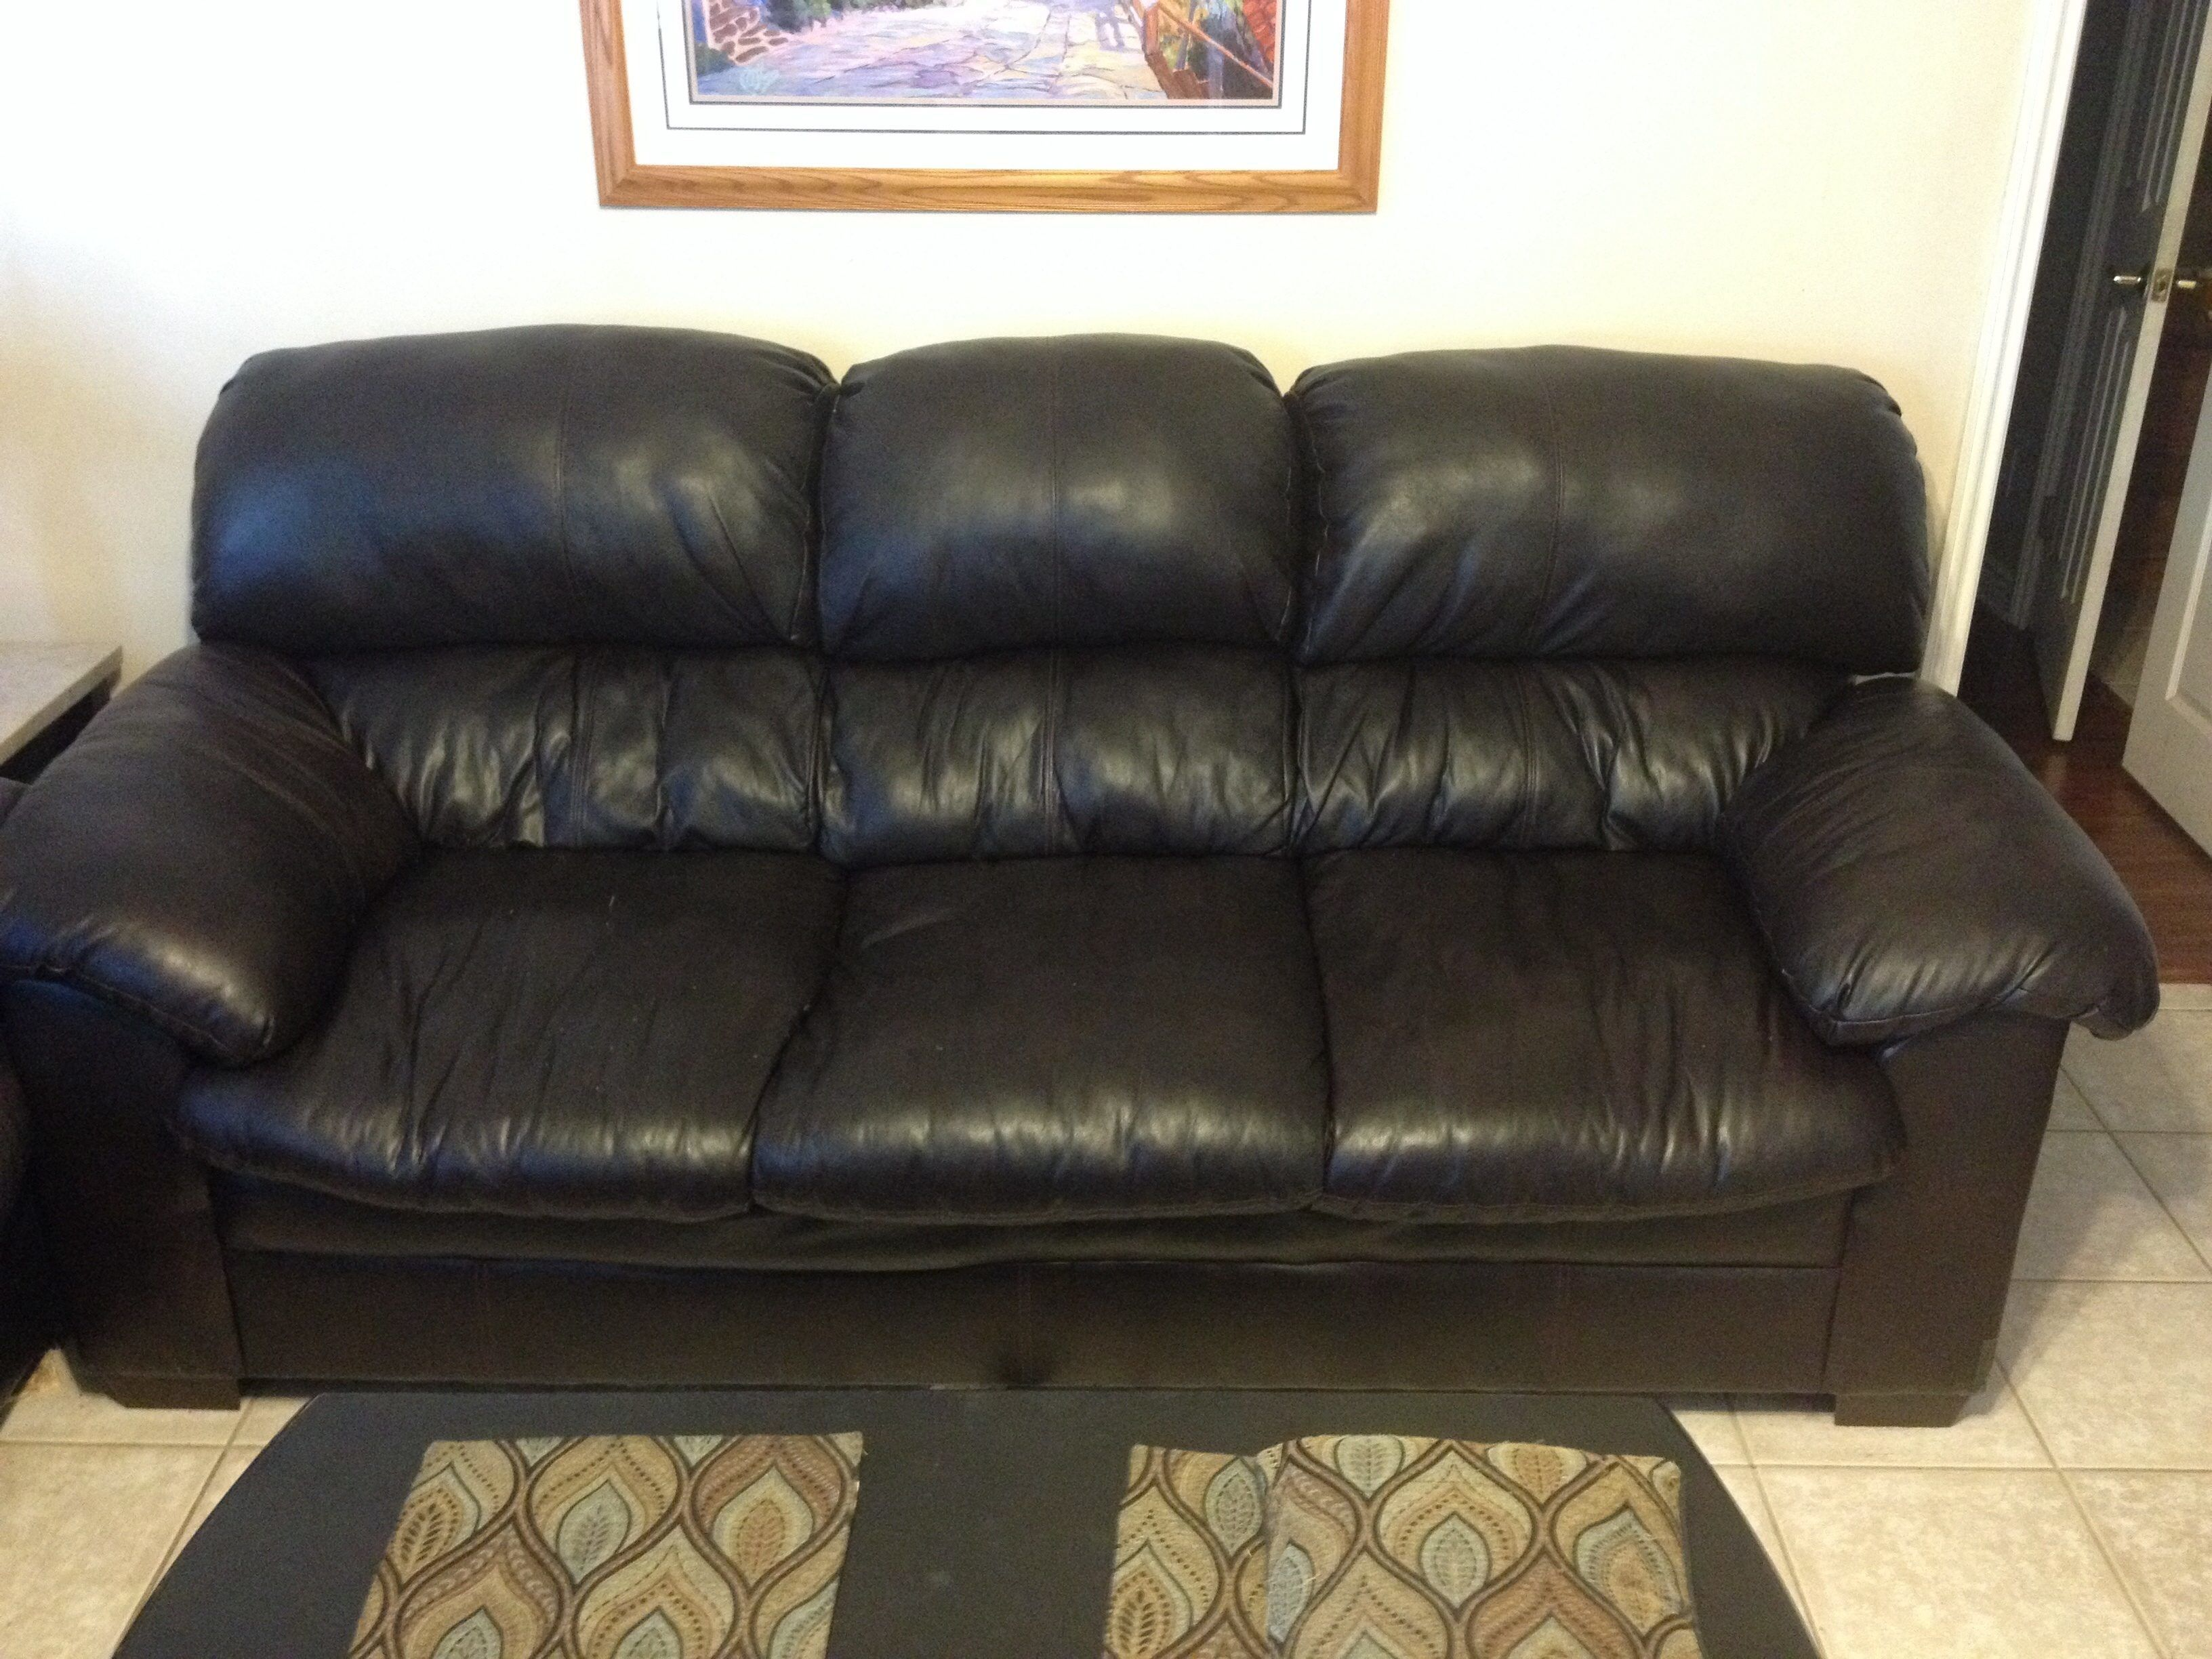 Simmons Couch Big Lots Sofacama Moderno Sofa Cama Moderno